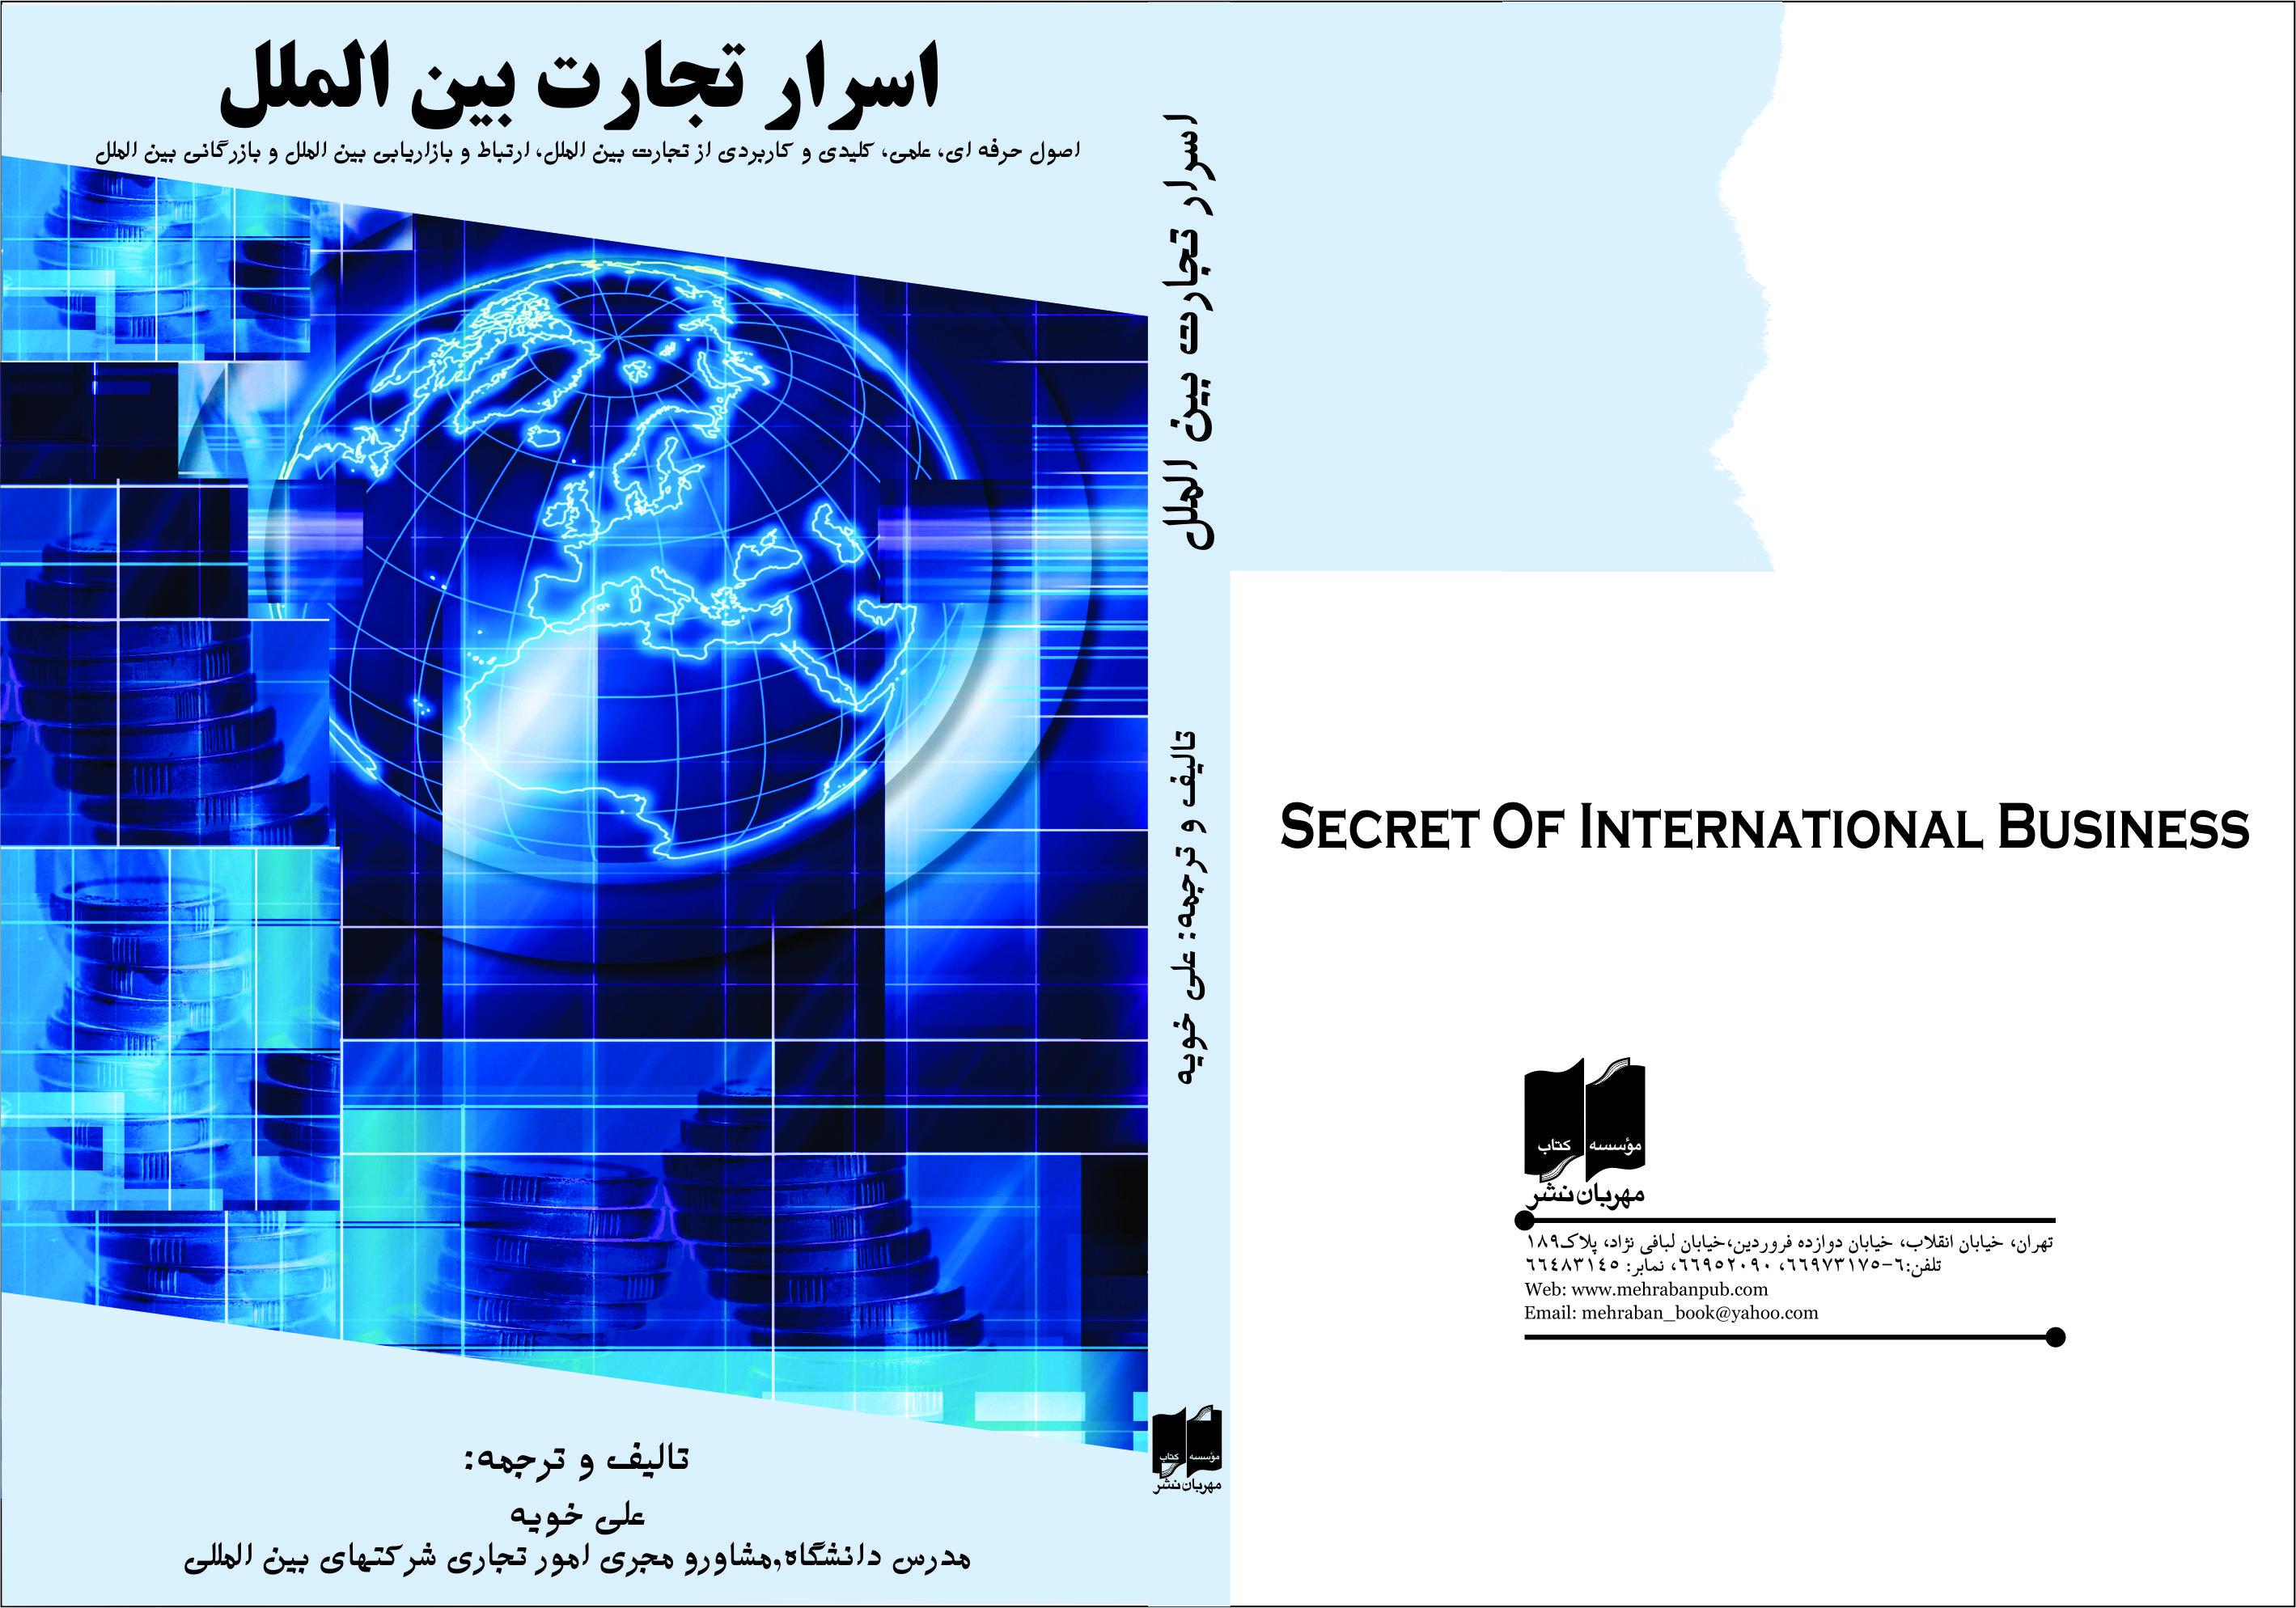 کتاب اسرار تجارت بین الملل - خویه